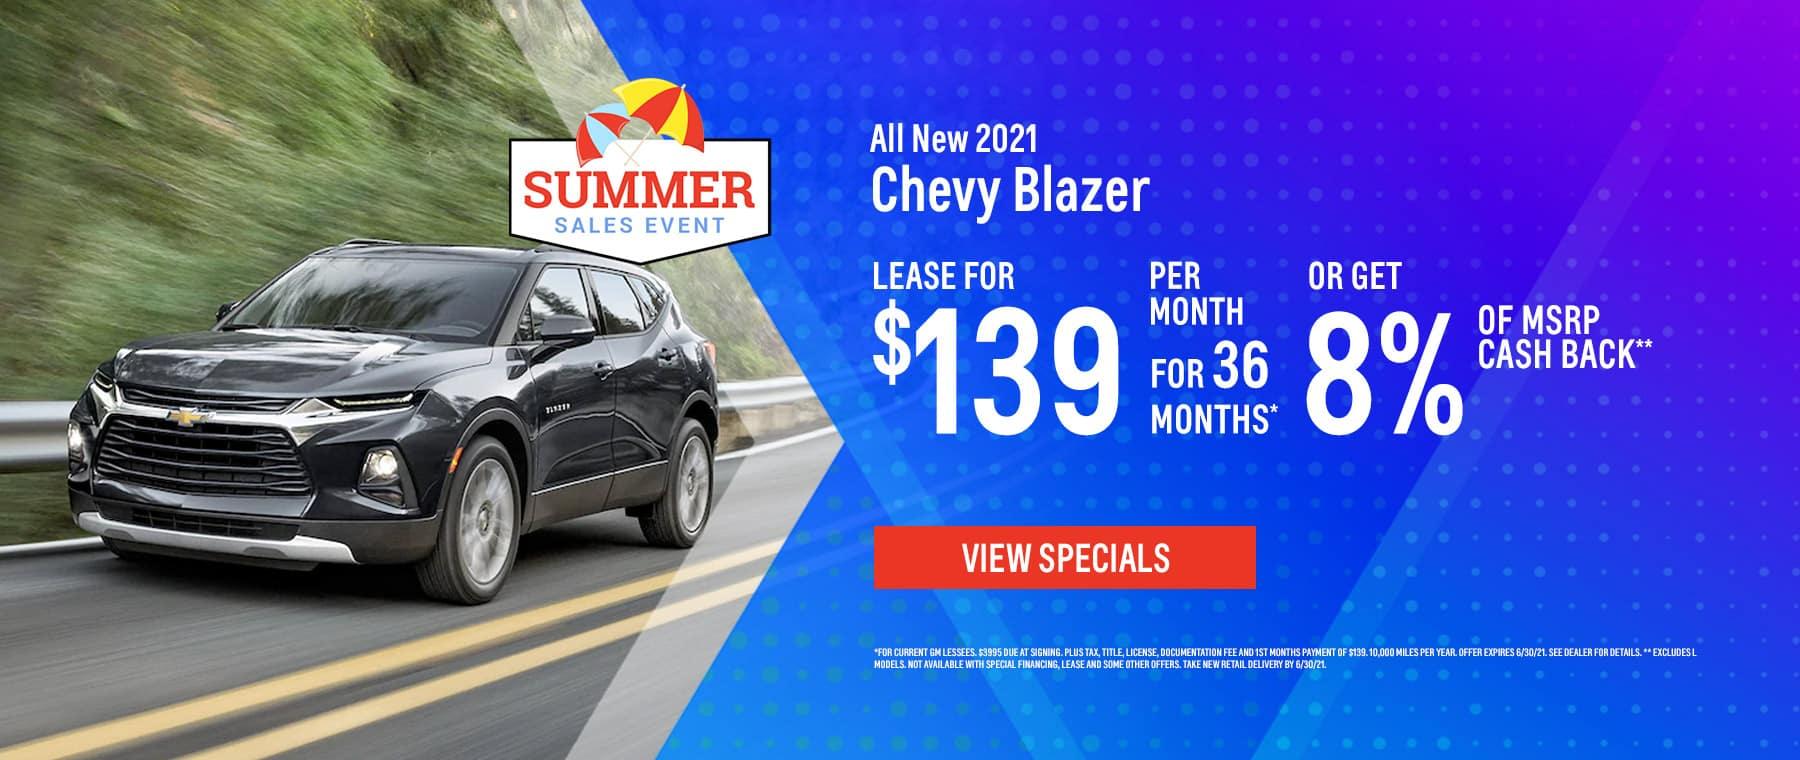 chevy blazer-1800×760-june-21-1